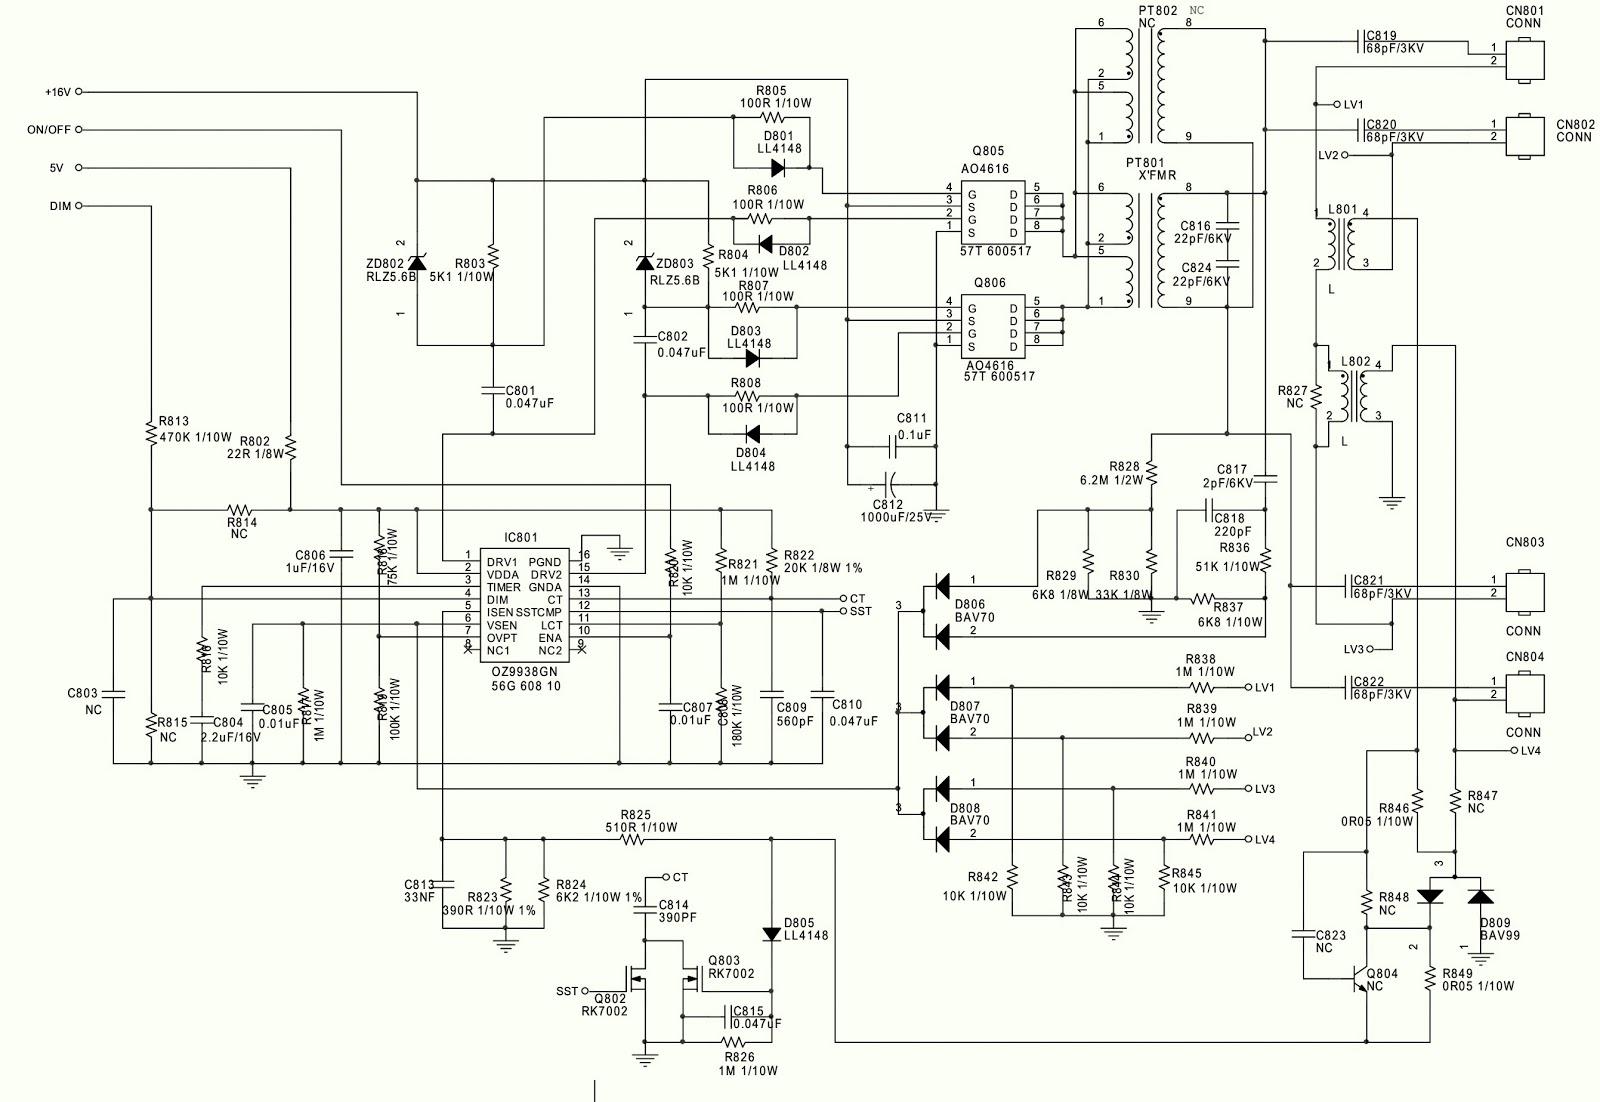 Aoc L19w981 Aoc L22w981 Aoc L26w98 Power Supply Smps And